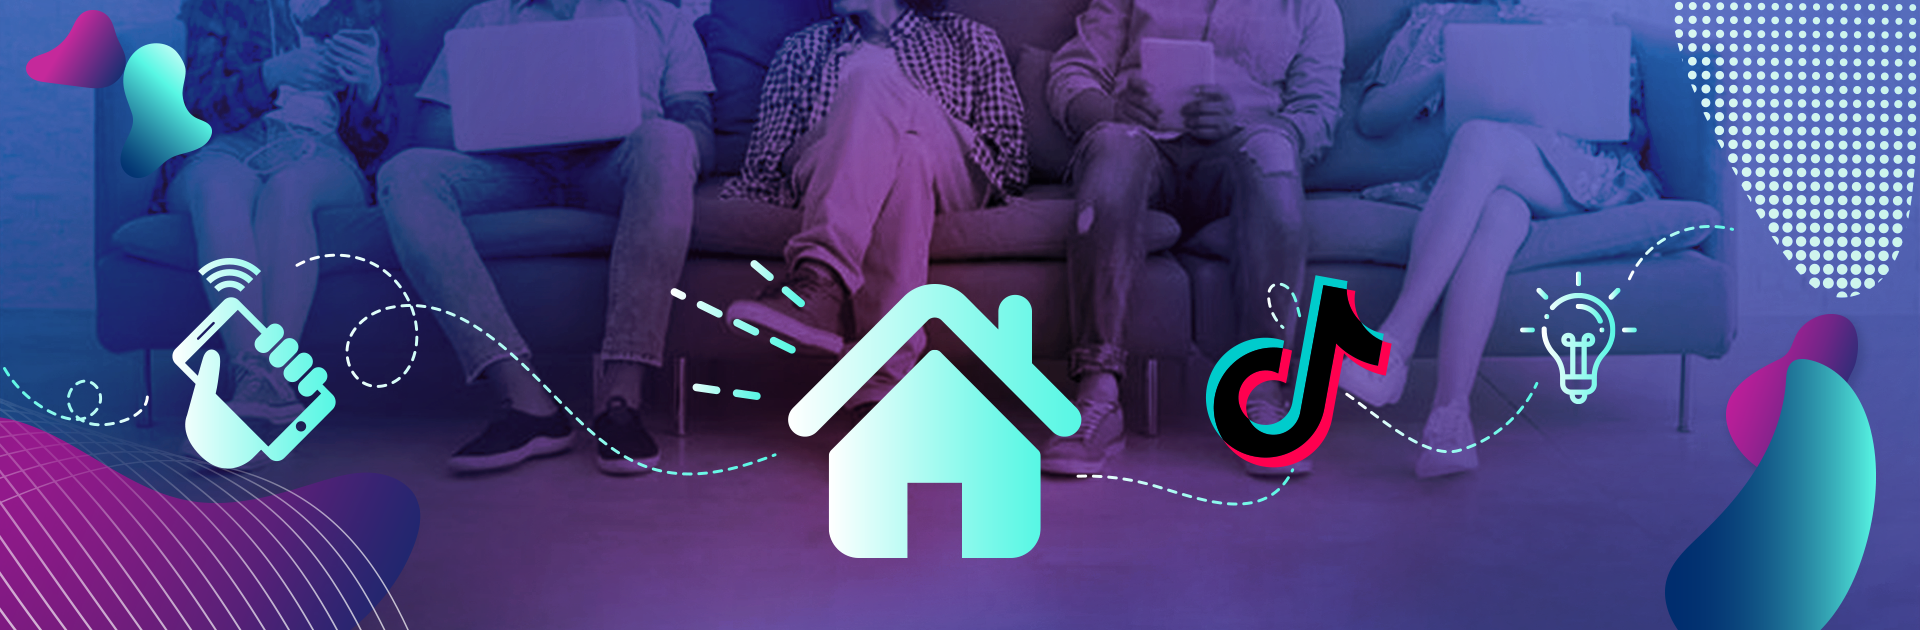 TikTok Houses, il fenomeno di New (Social) Reality Engagement